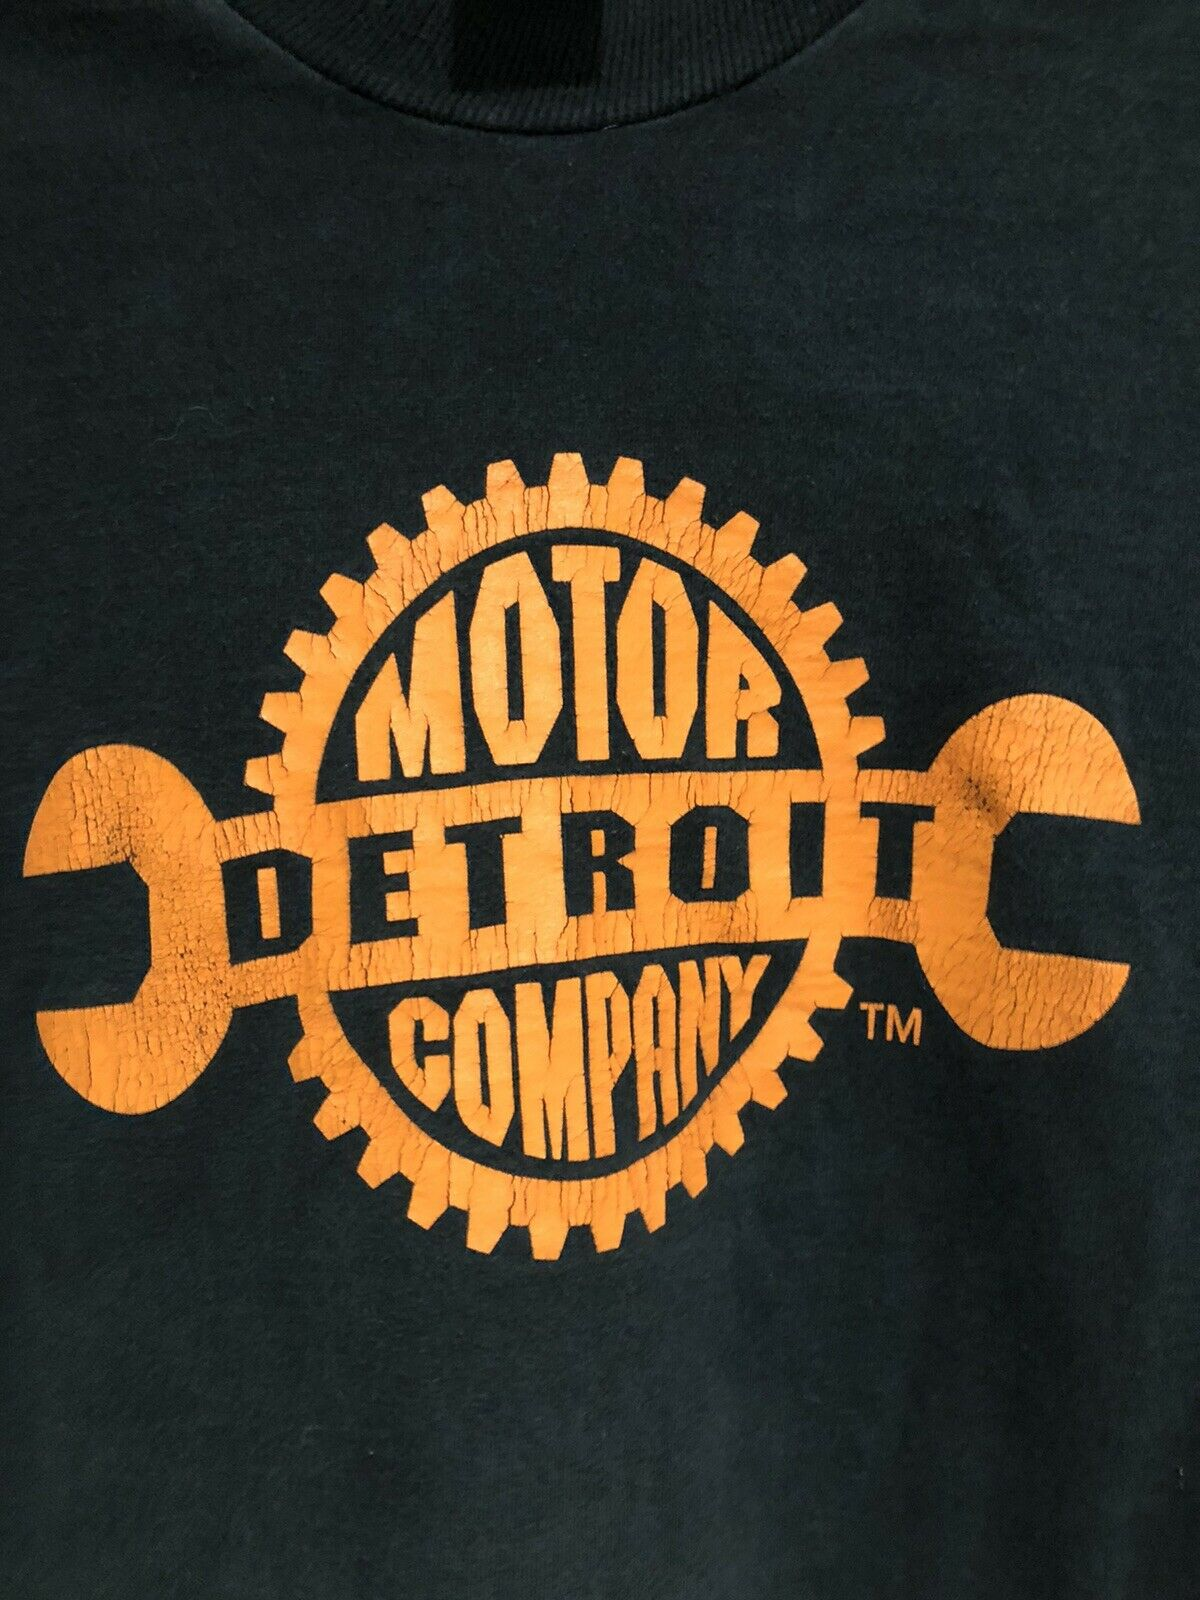 Vintage 90s Detroit Motor Company Long Sleeve T S… - image 2